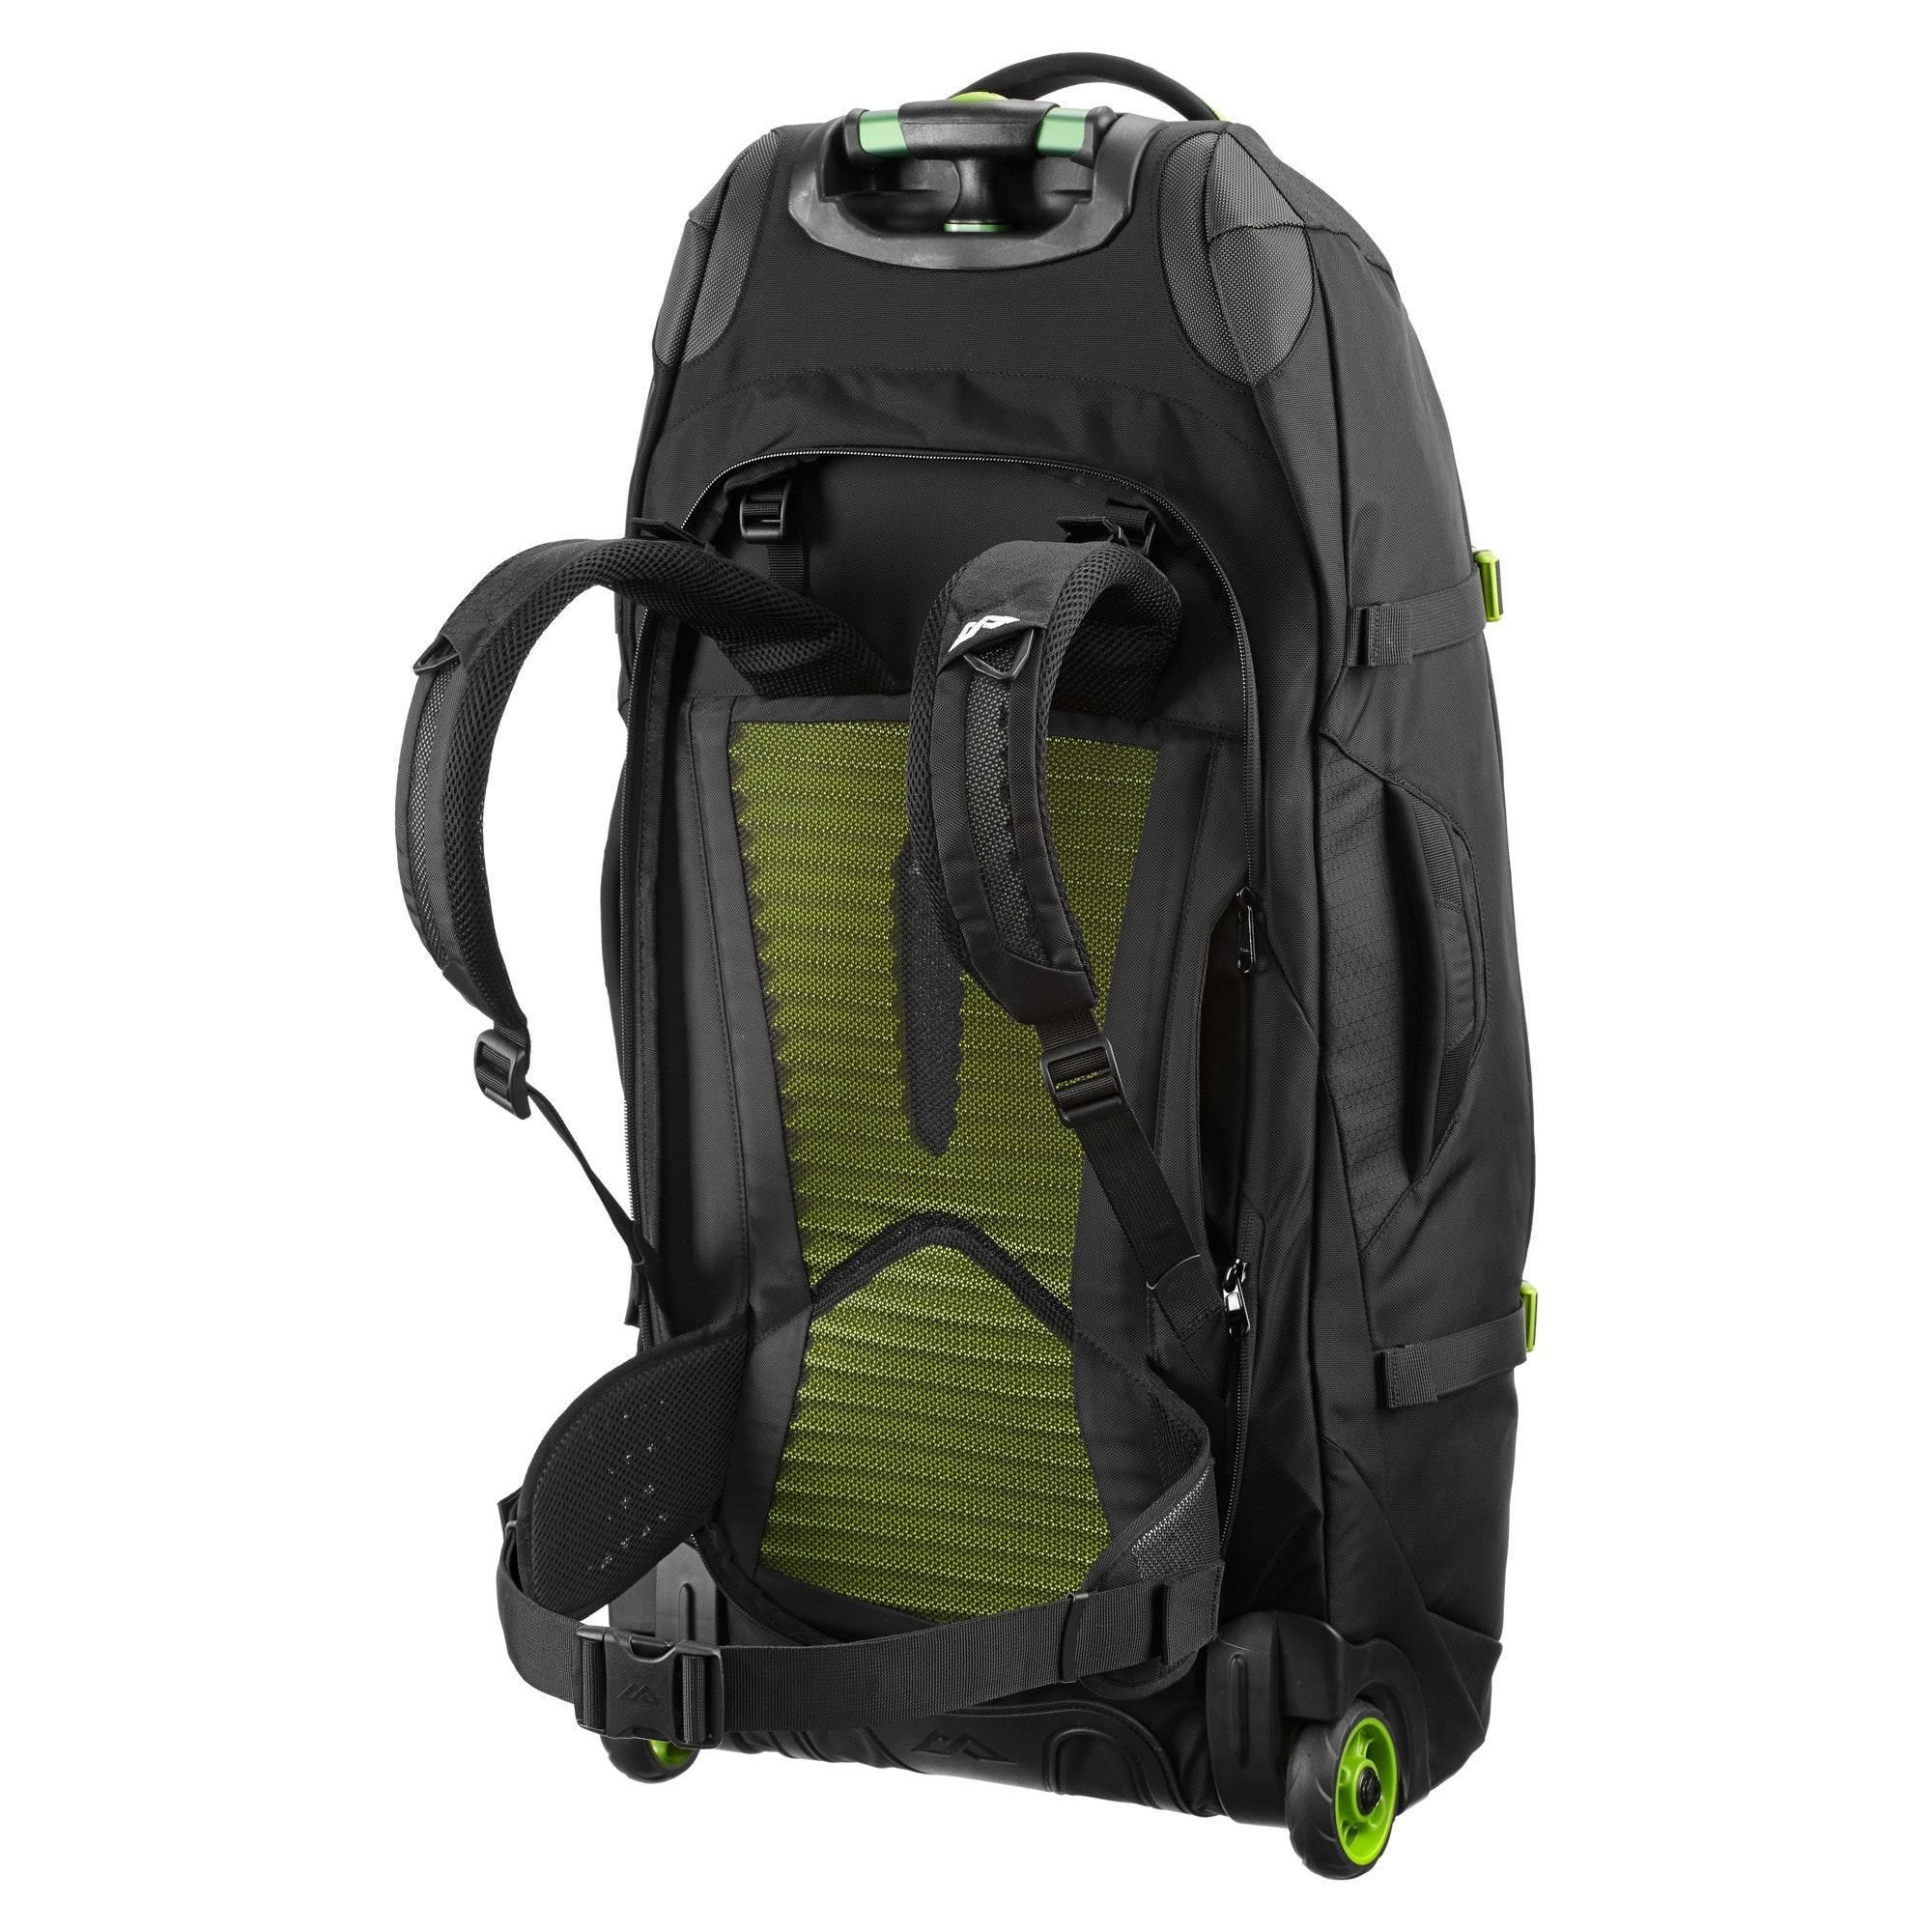 thumbnail 8 - NEW-Kathmandu-Hybrid-70L-Backpack-Wheeled-Handle-Luggage-Bag-Travel-Trolley